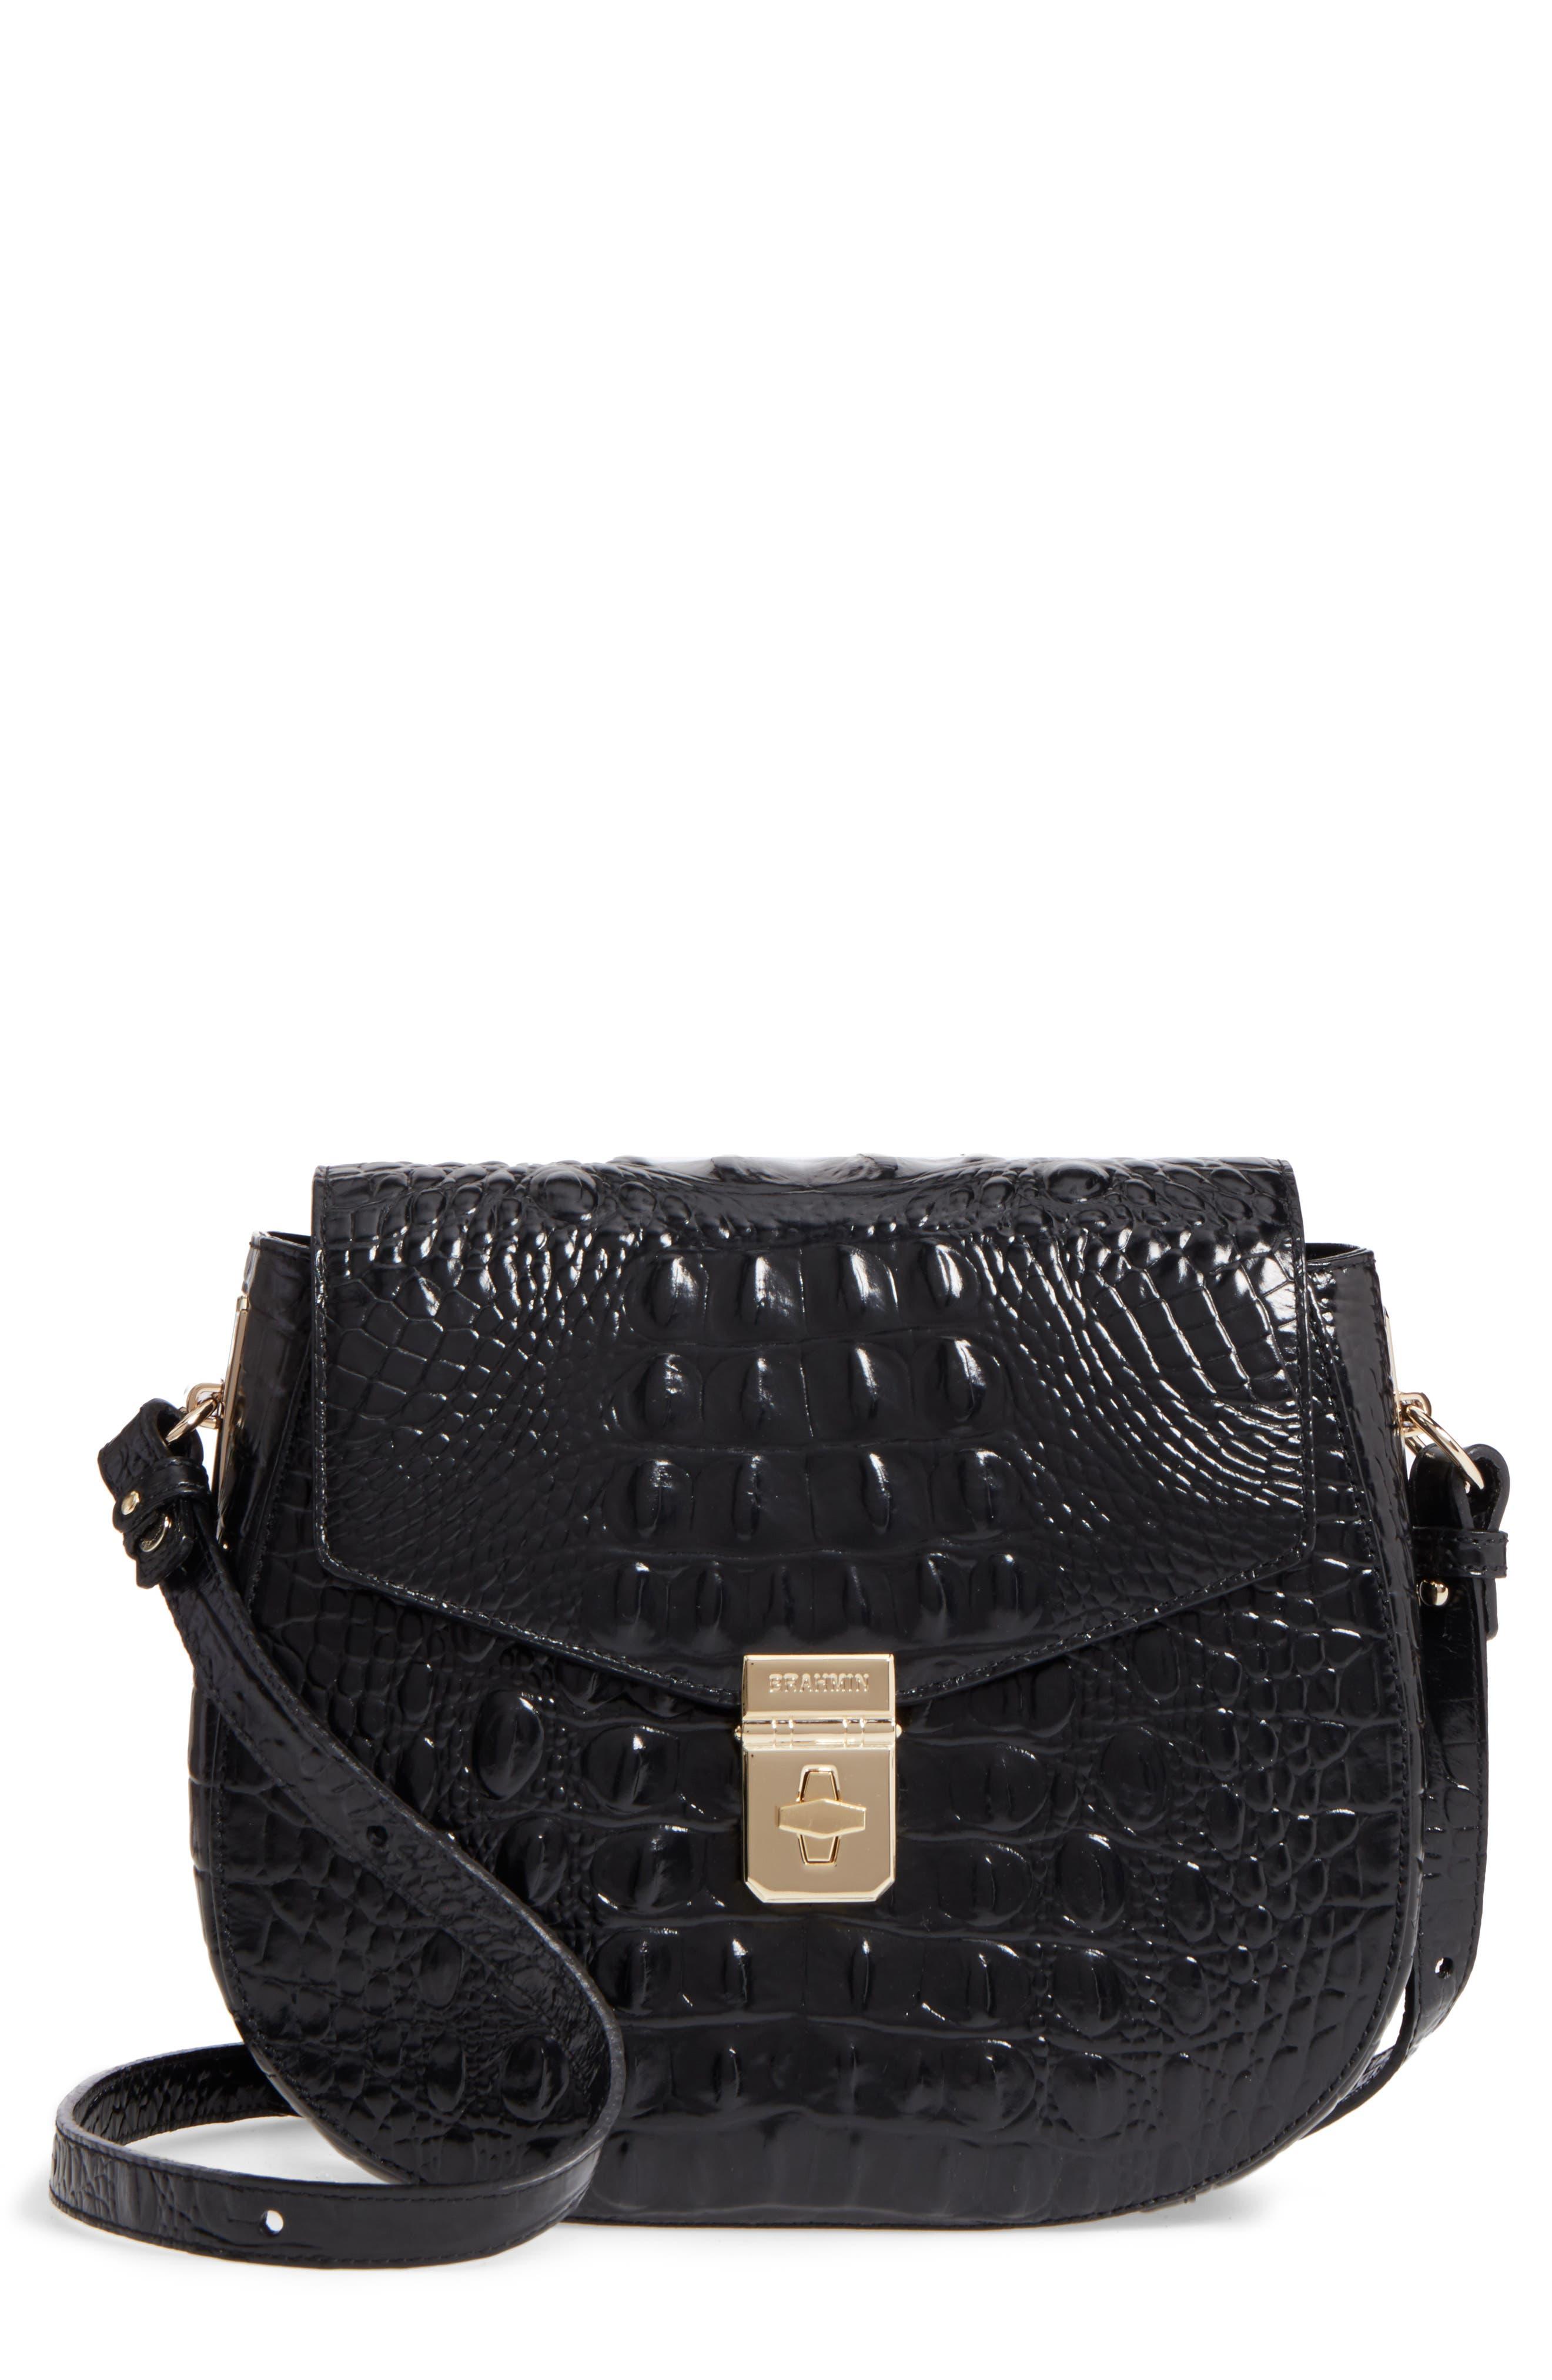 Melbourne - Lizzie Leather Crossbody Bag,                             Main thumbnail 1, color,